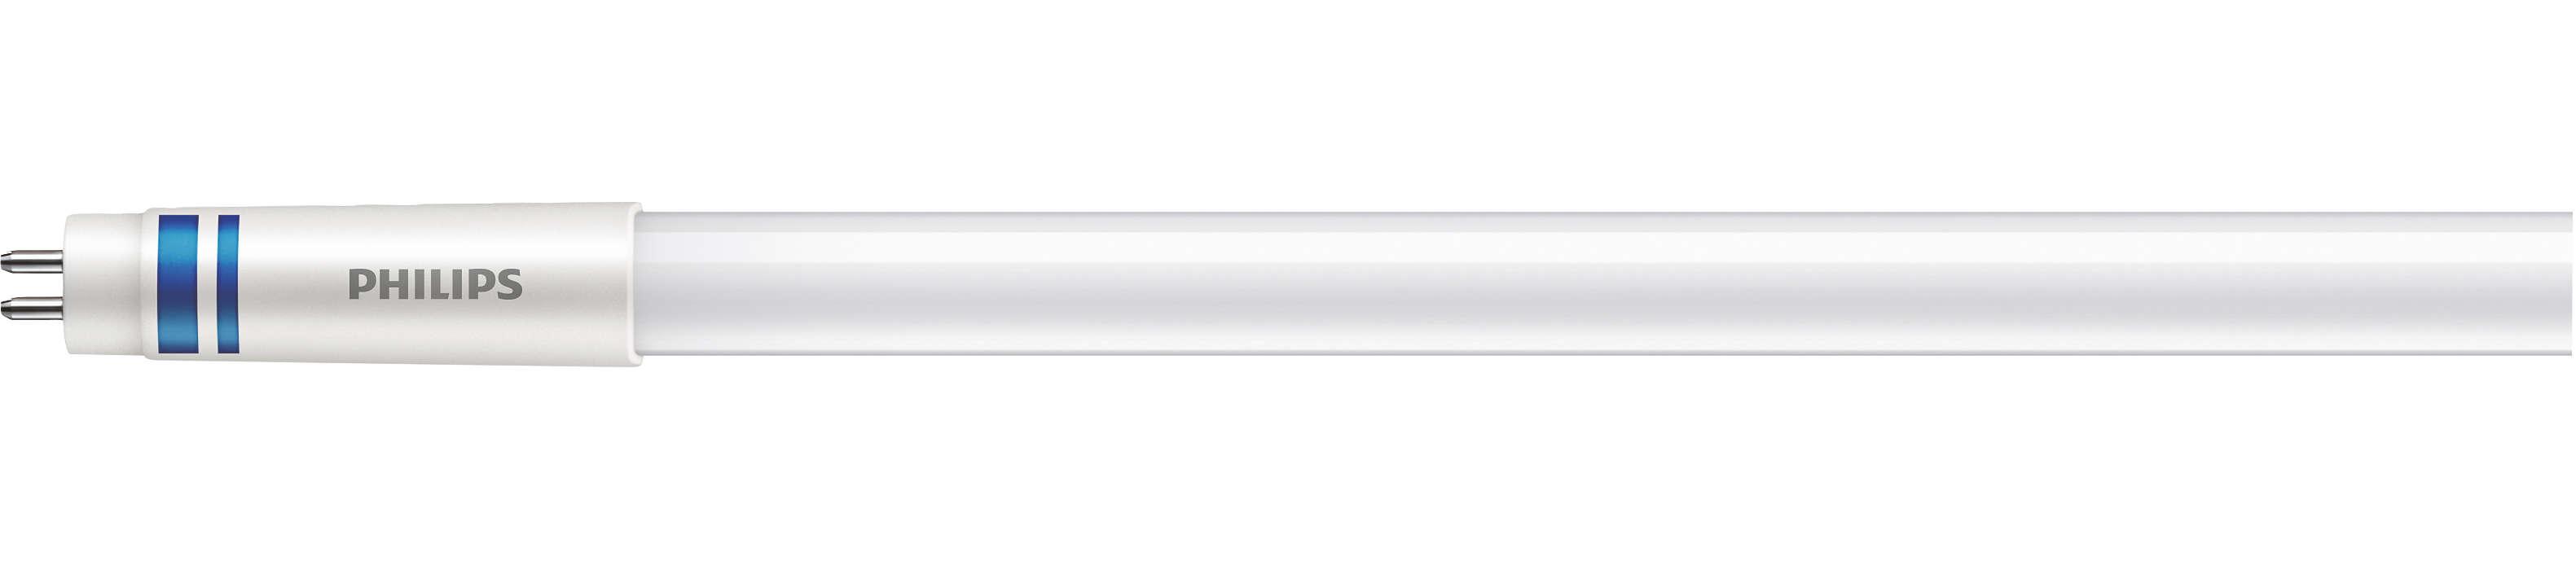 The new generation of energy-saving T5 tube lighting